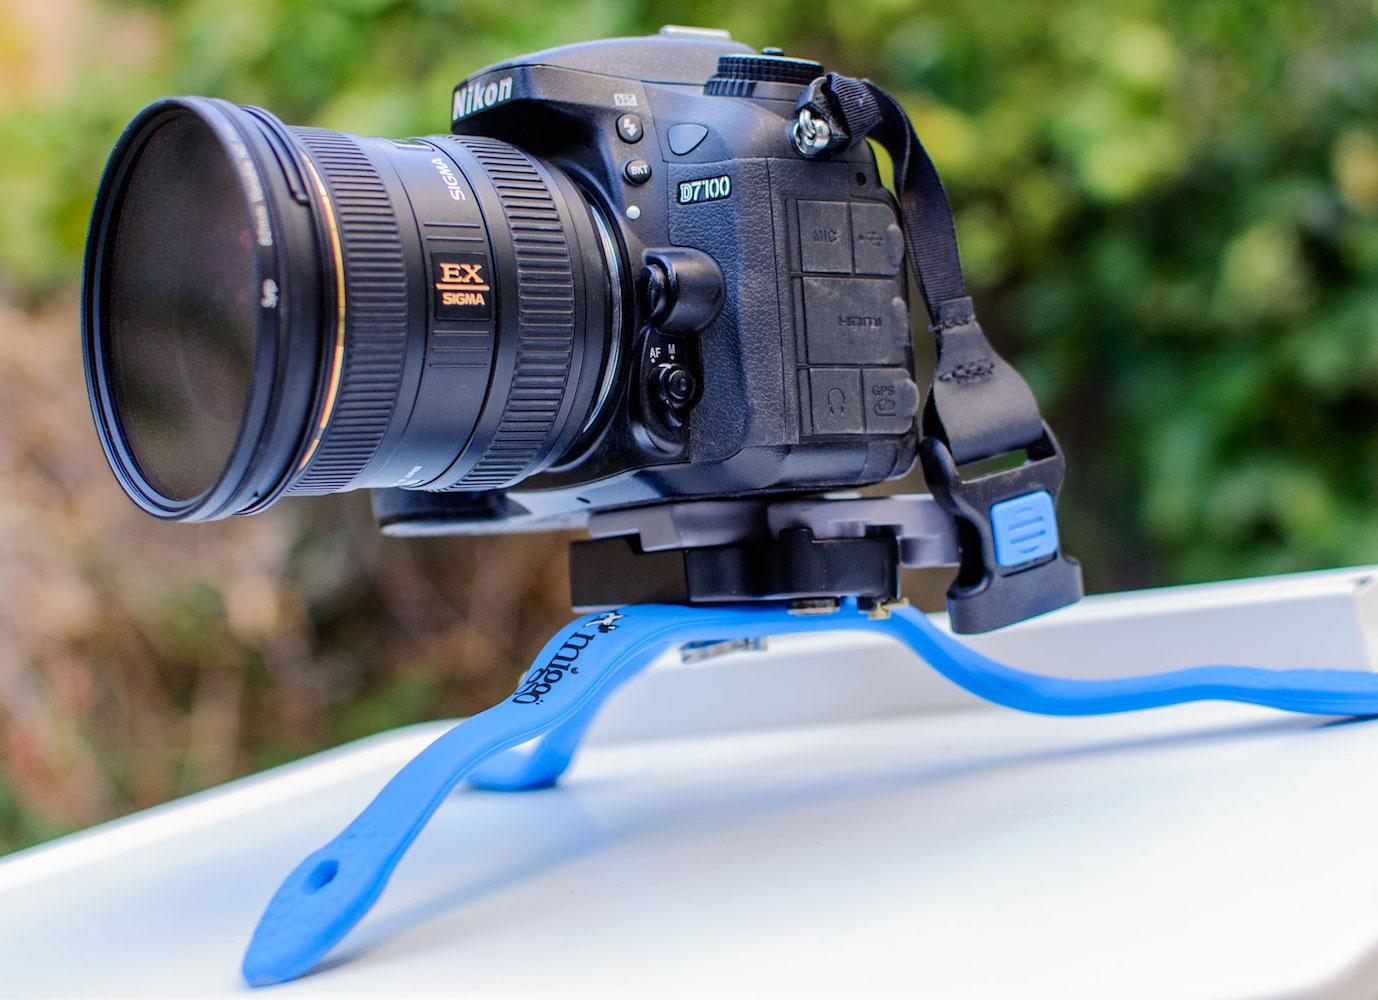 Miggo Splat – Flexible Tripod for Action Cameras